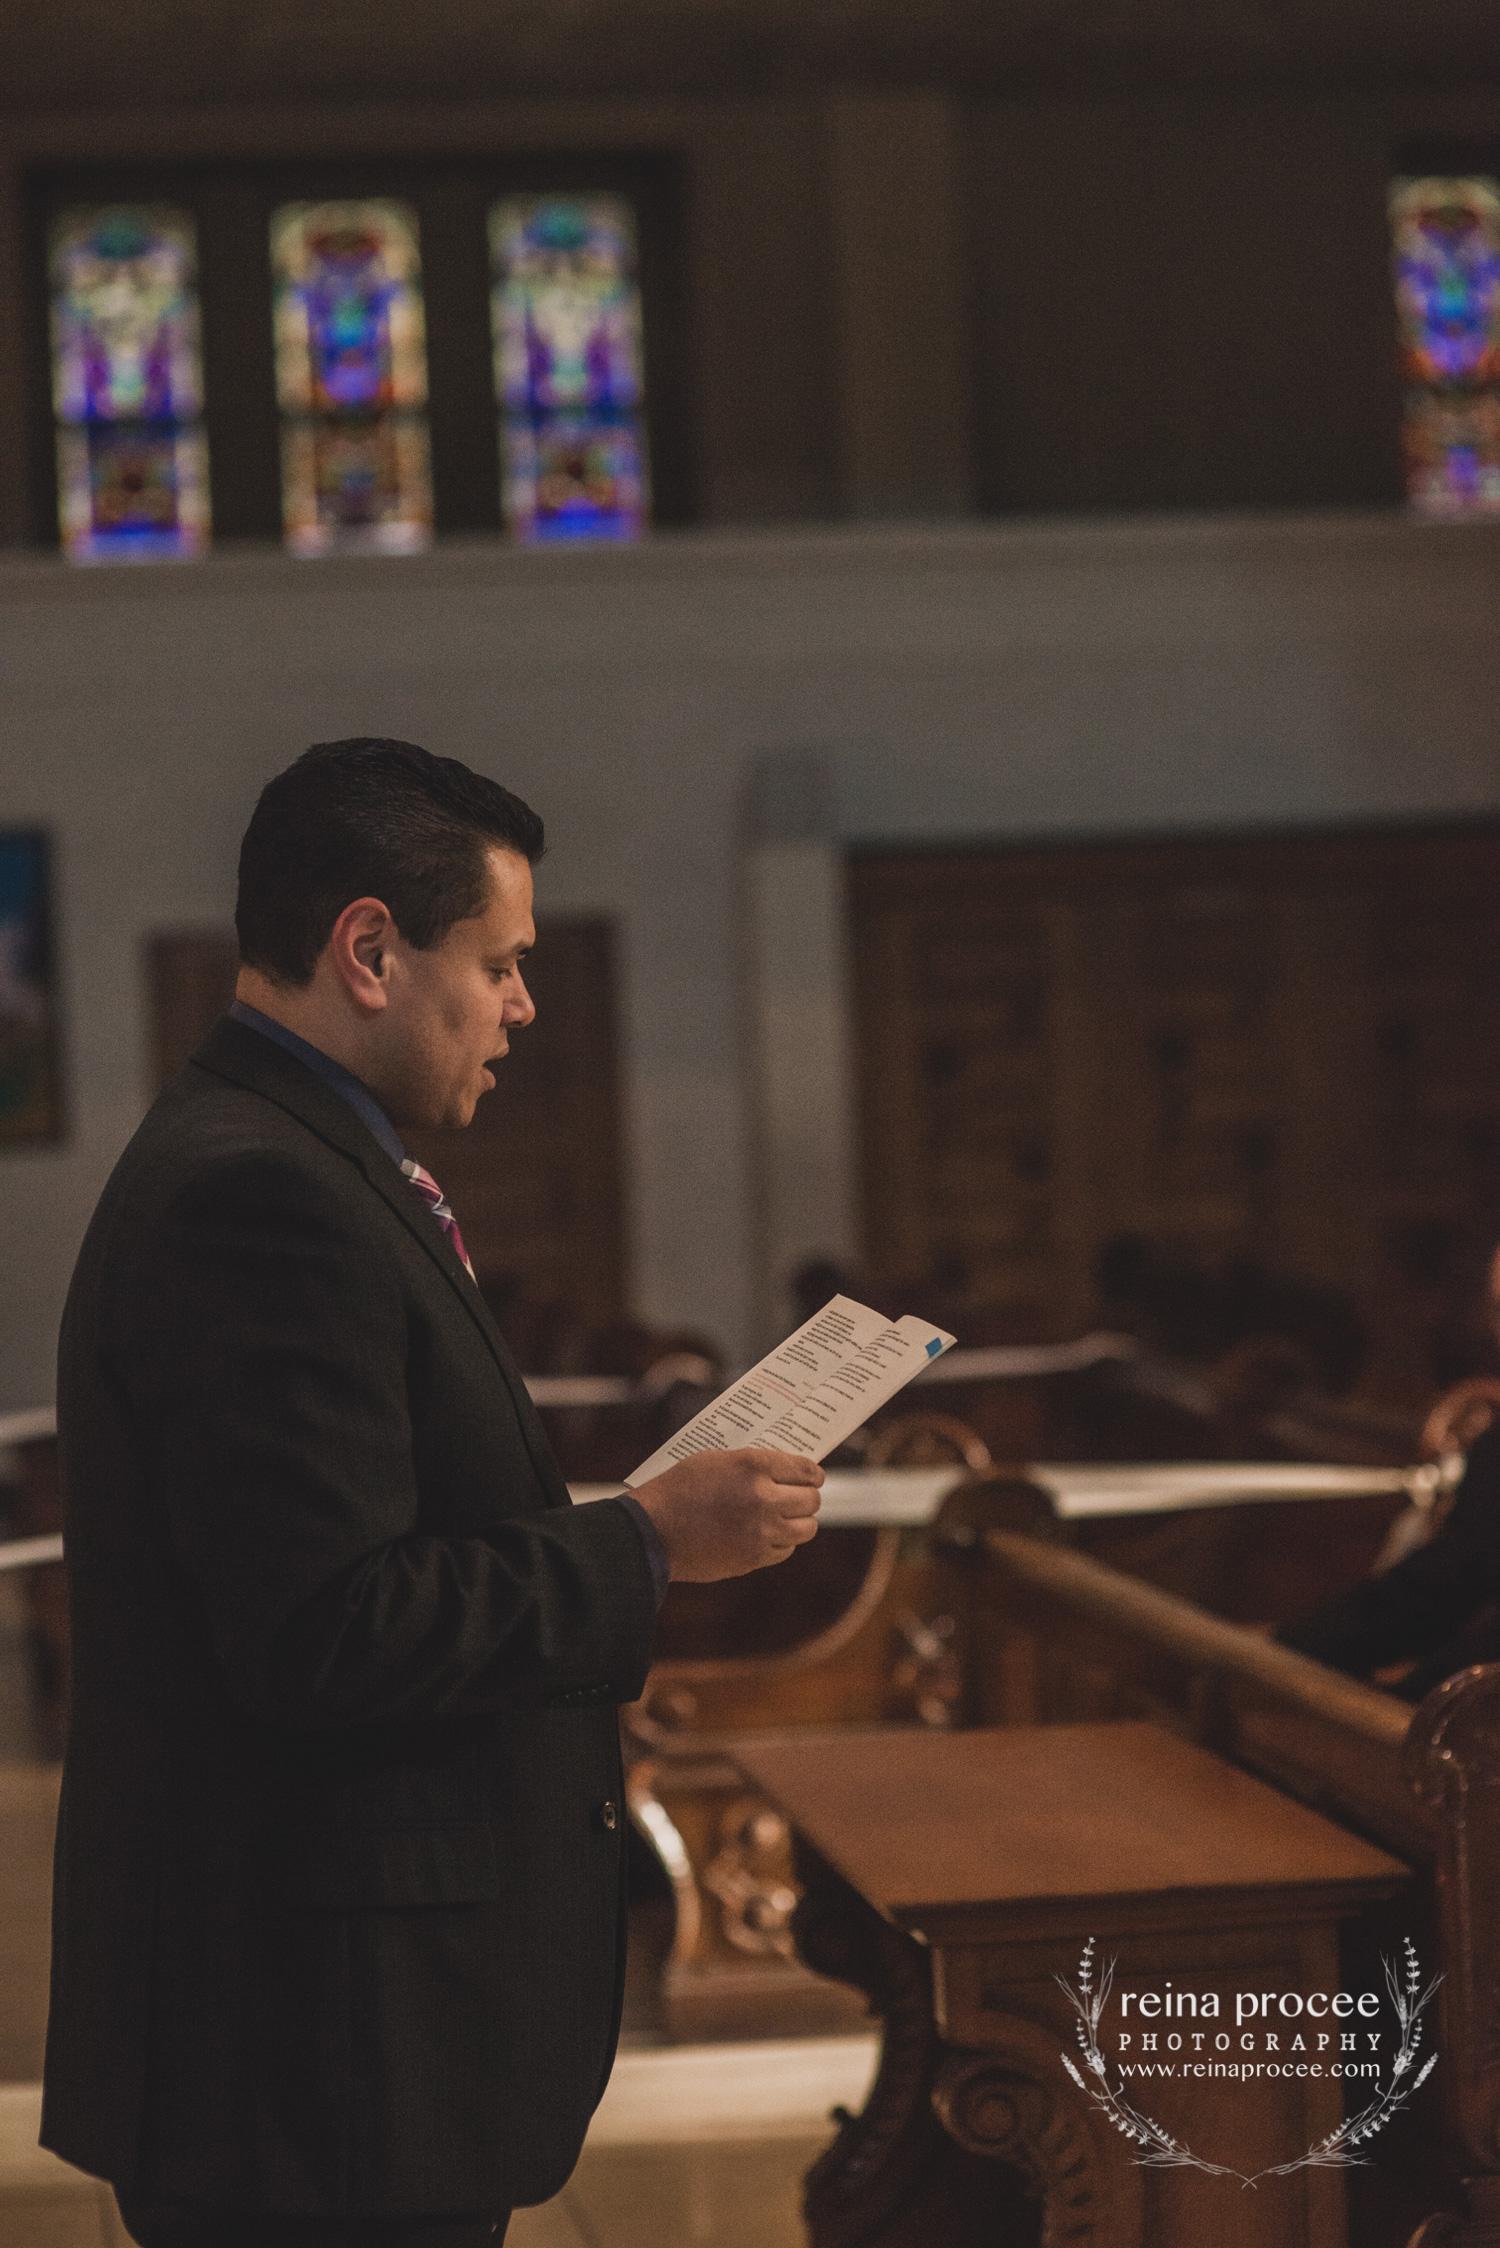 028-baptism-photographer-montreal-family-best-photos-portraits.jpg